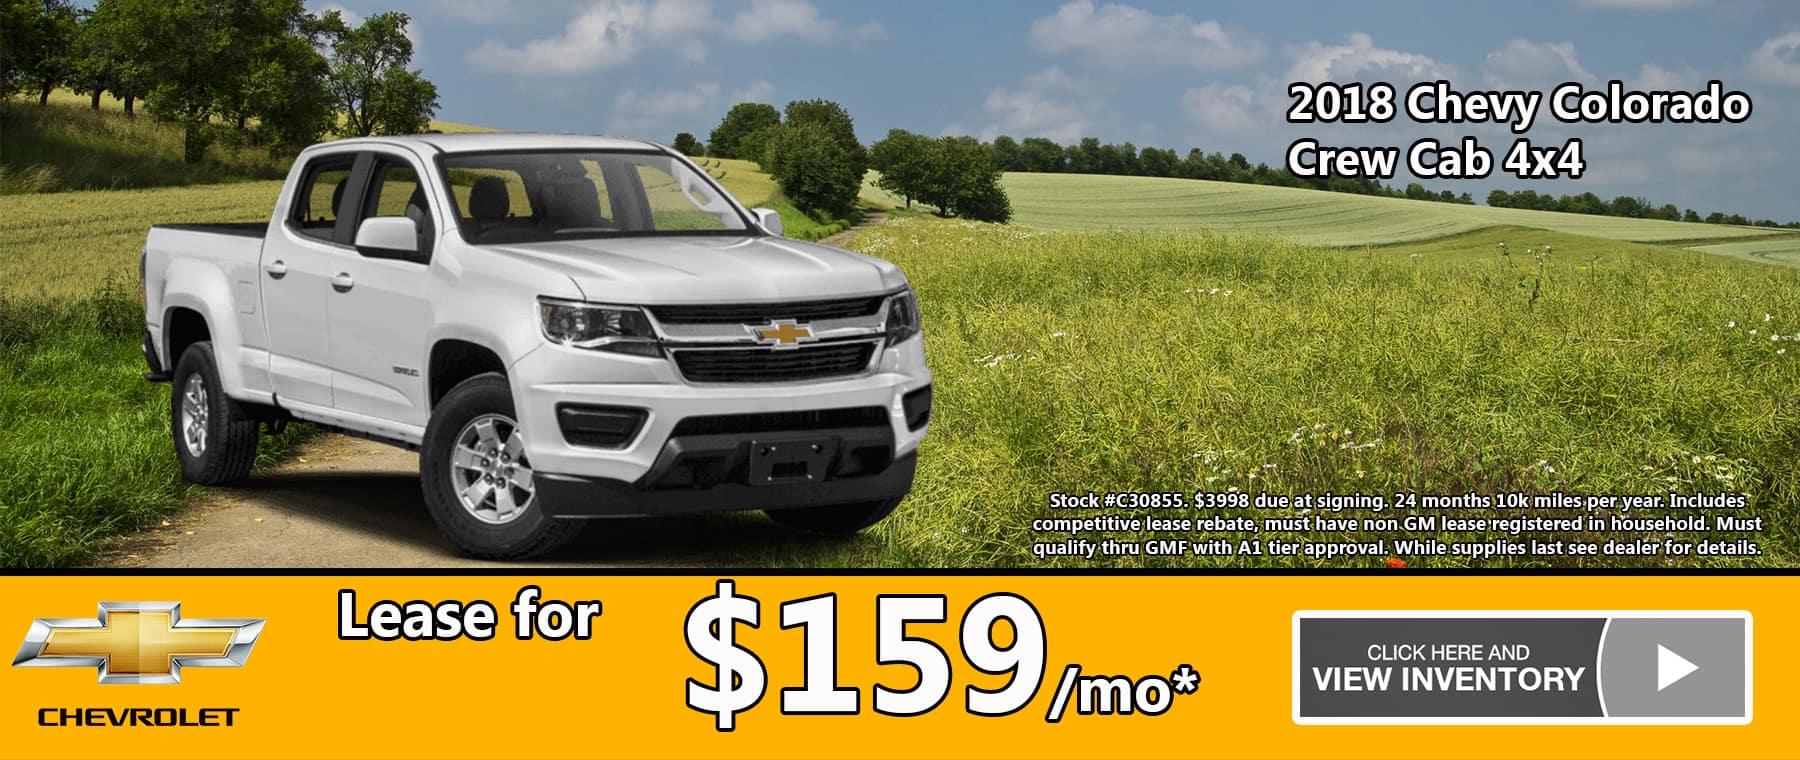 Dover Chevrolet | Chevrolet Dealer in Dover, NH